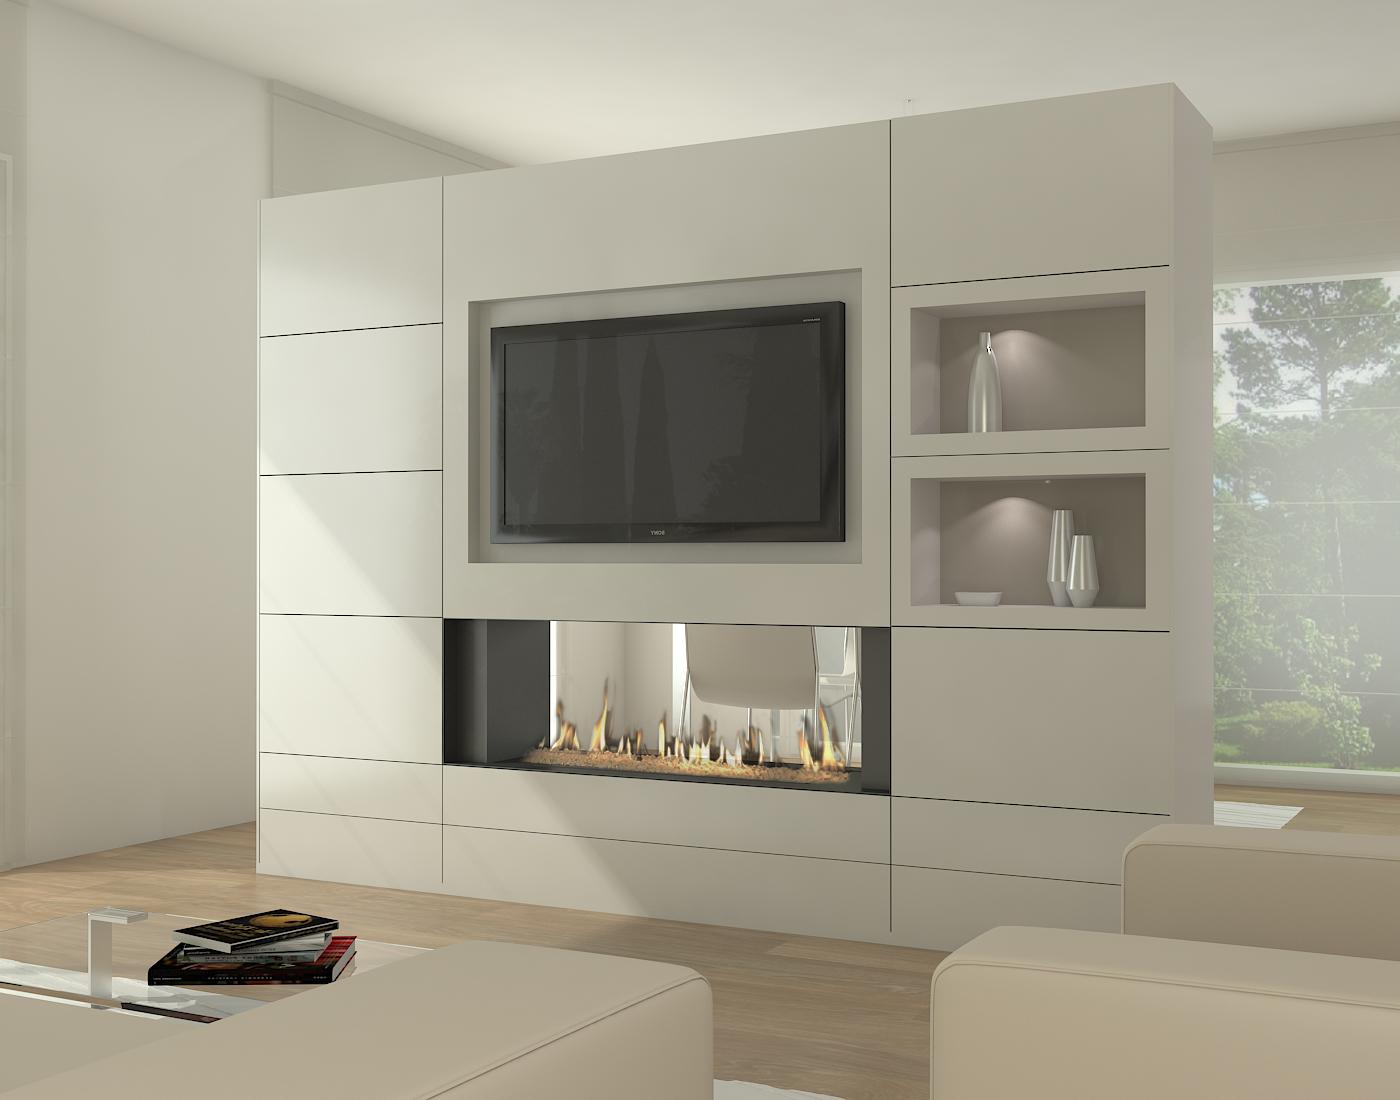 Muebles De Salon Con Chimenea Integrada Zwd9 Muebles De Salon Con Chimenea Electrica Amazing Chimeneas Modernas